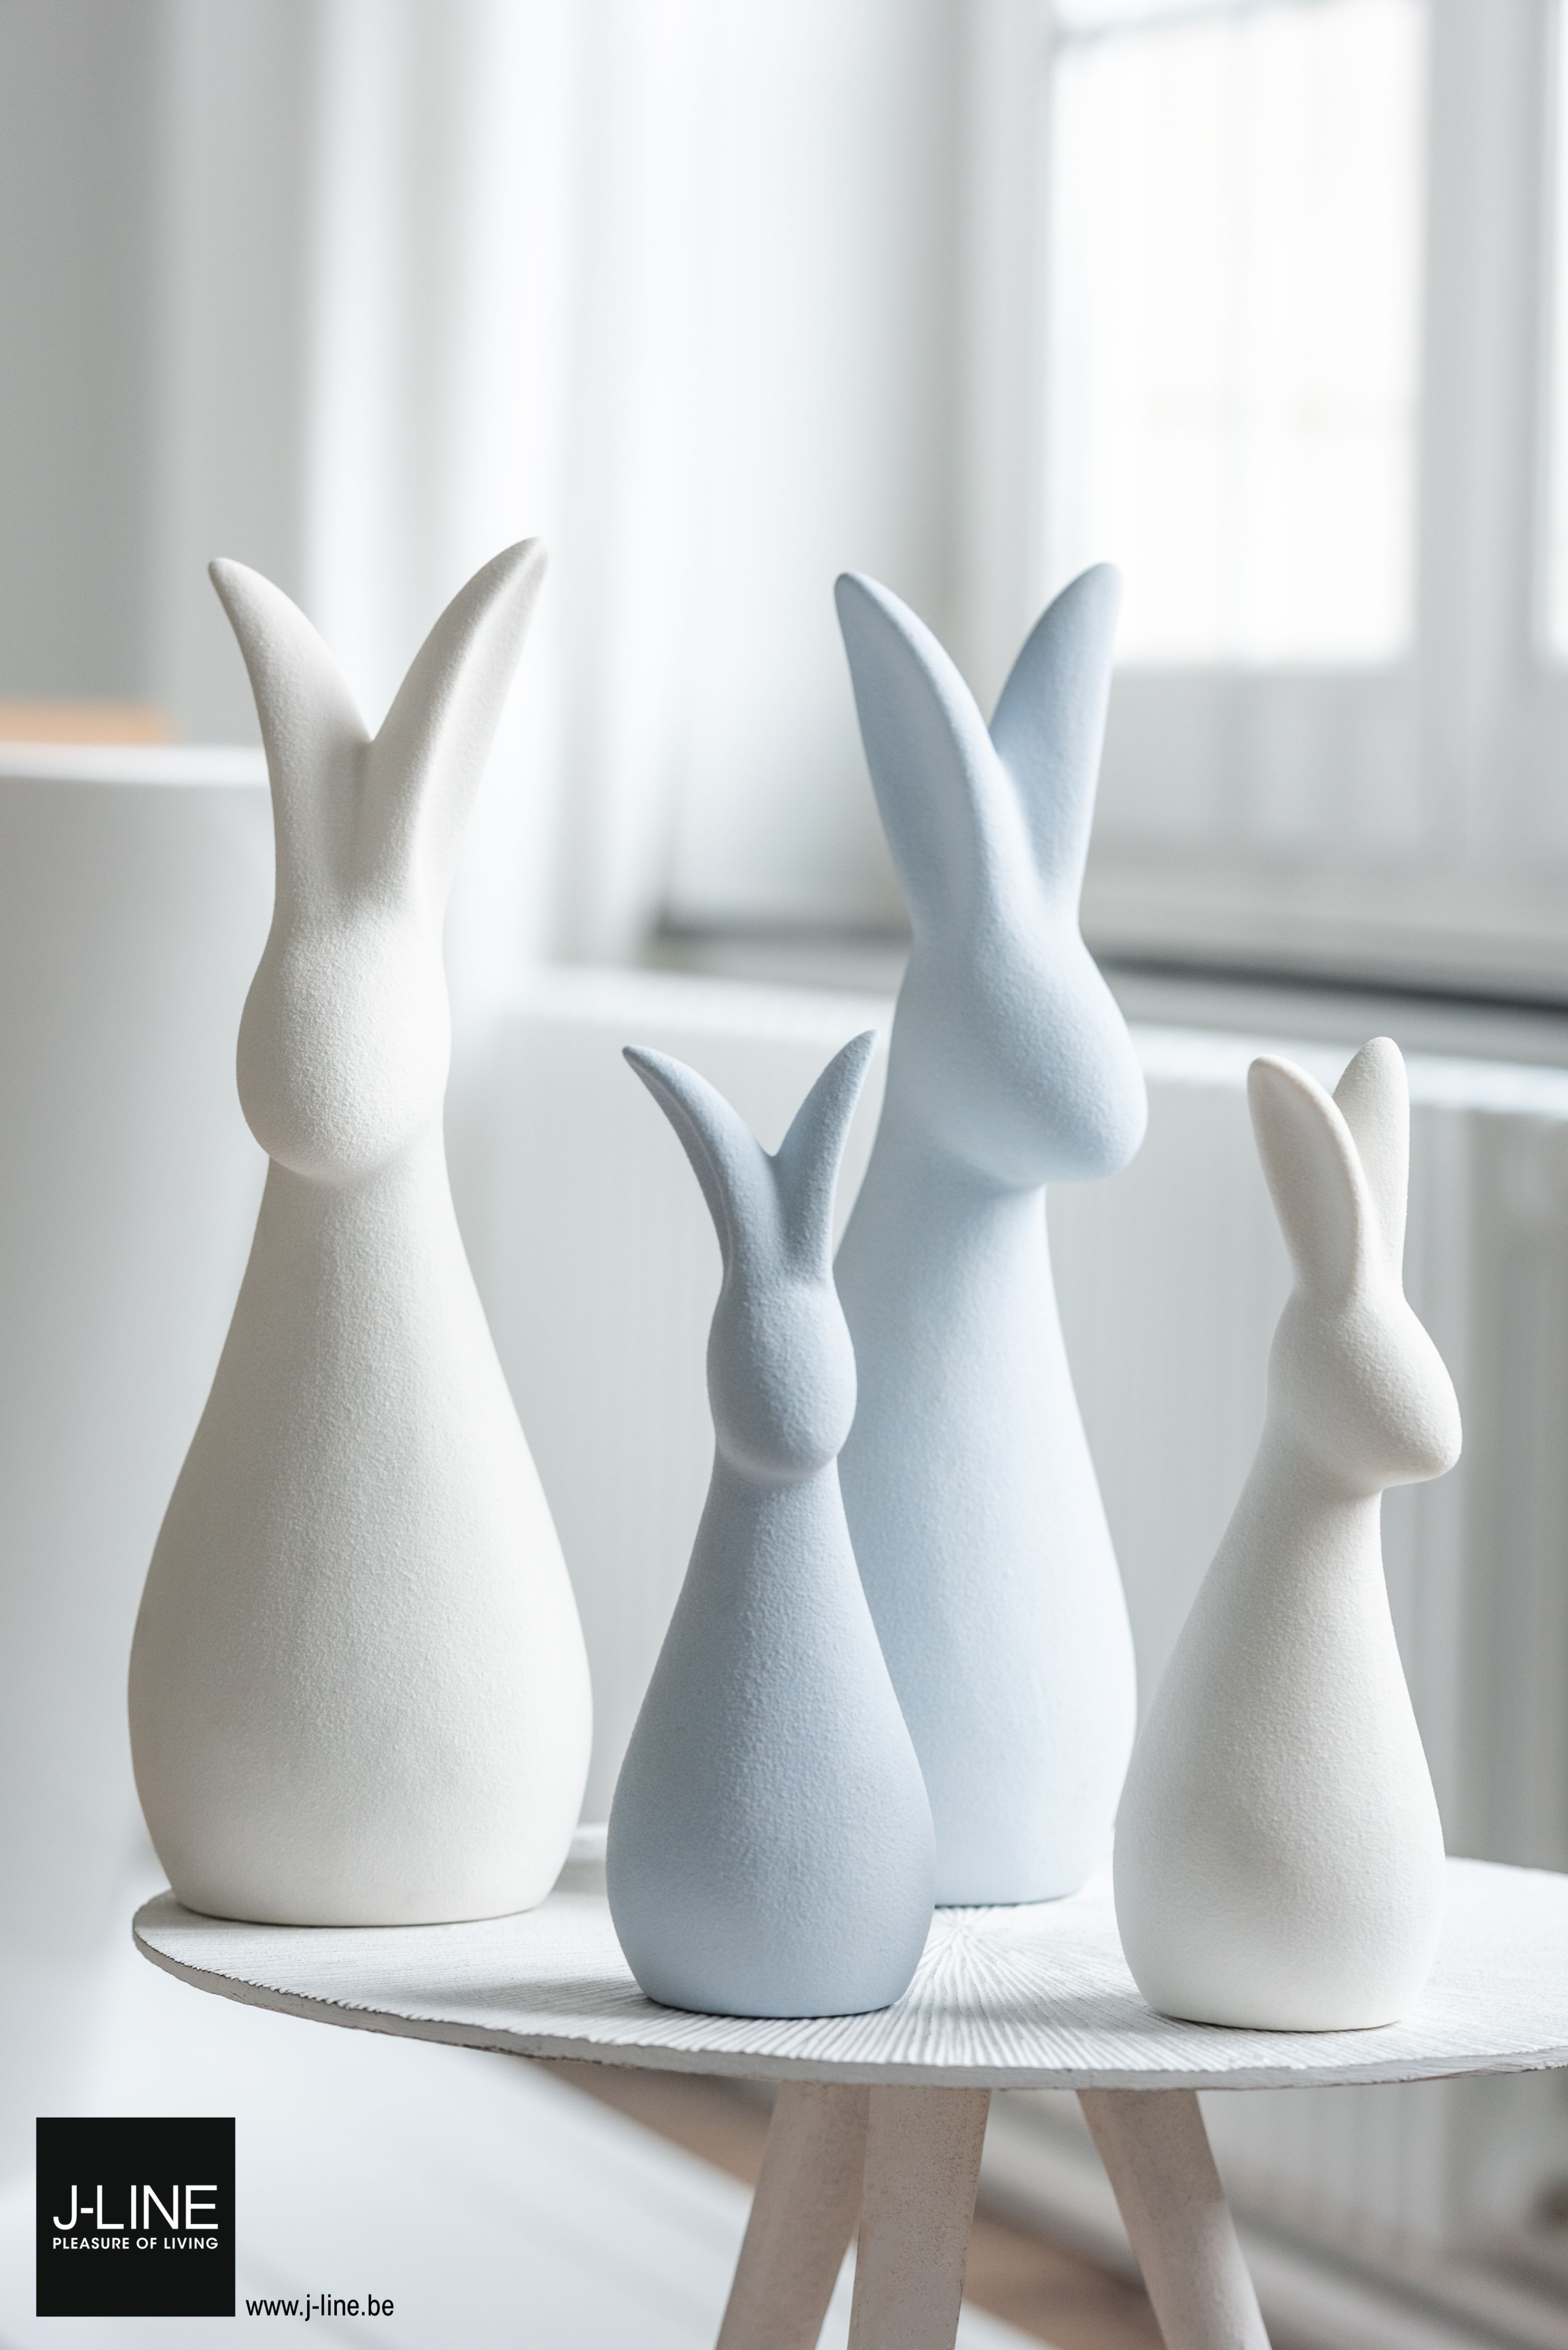 Jline Decoration Endlessblue New Spring Summer Collection 2020 Sidetable Line Metal Matte Rabbit Porcelain White Blue Pleasureofliving Jl Pasen